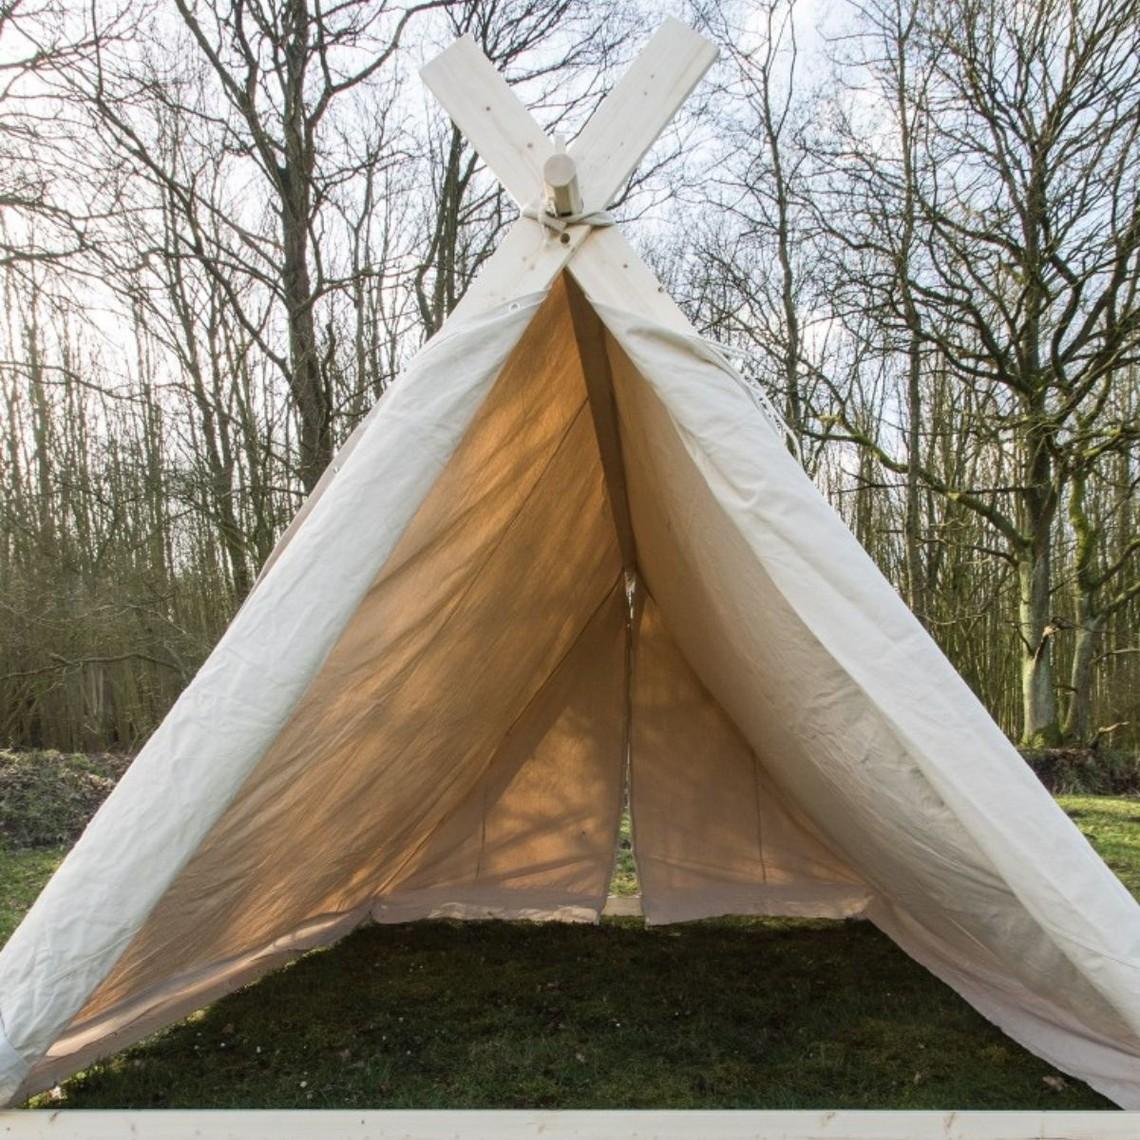 Tenda vichinga 2 x 2,3 x 1,8 m senza telaio, 350 grammi